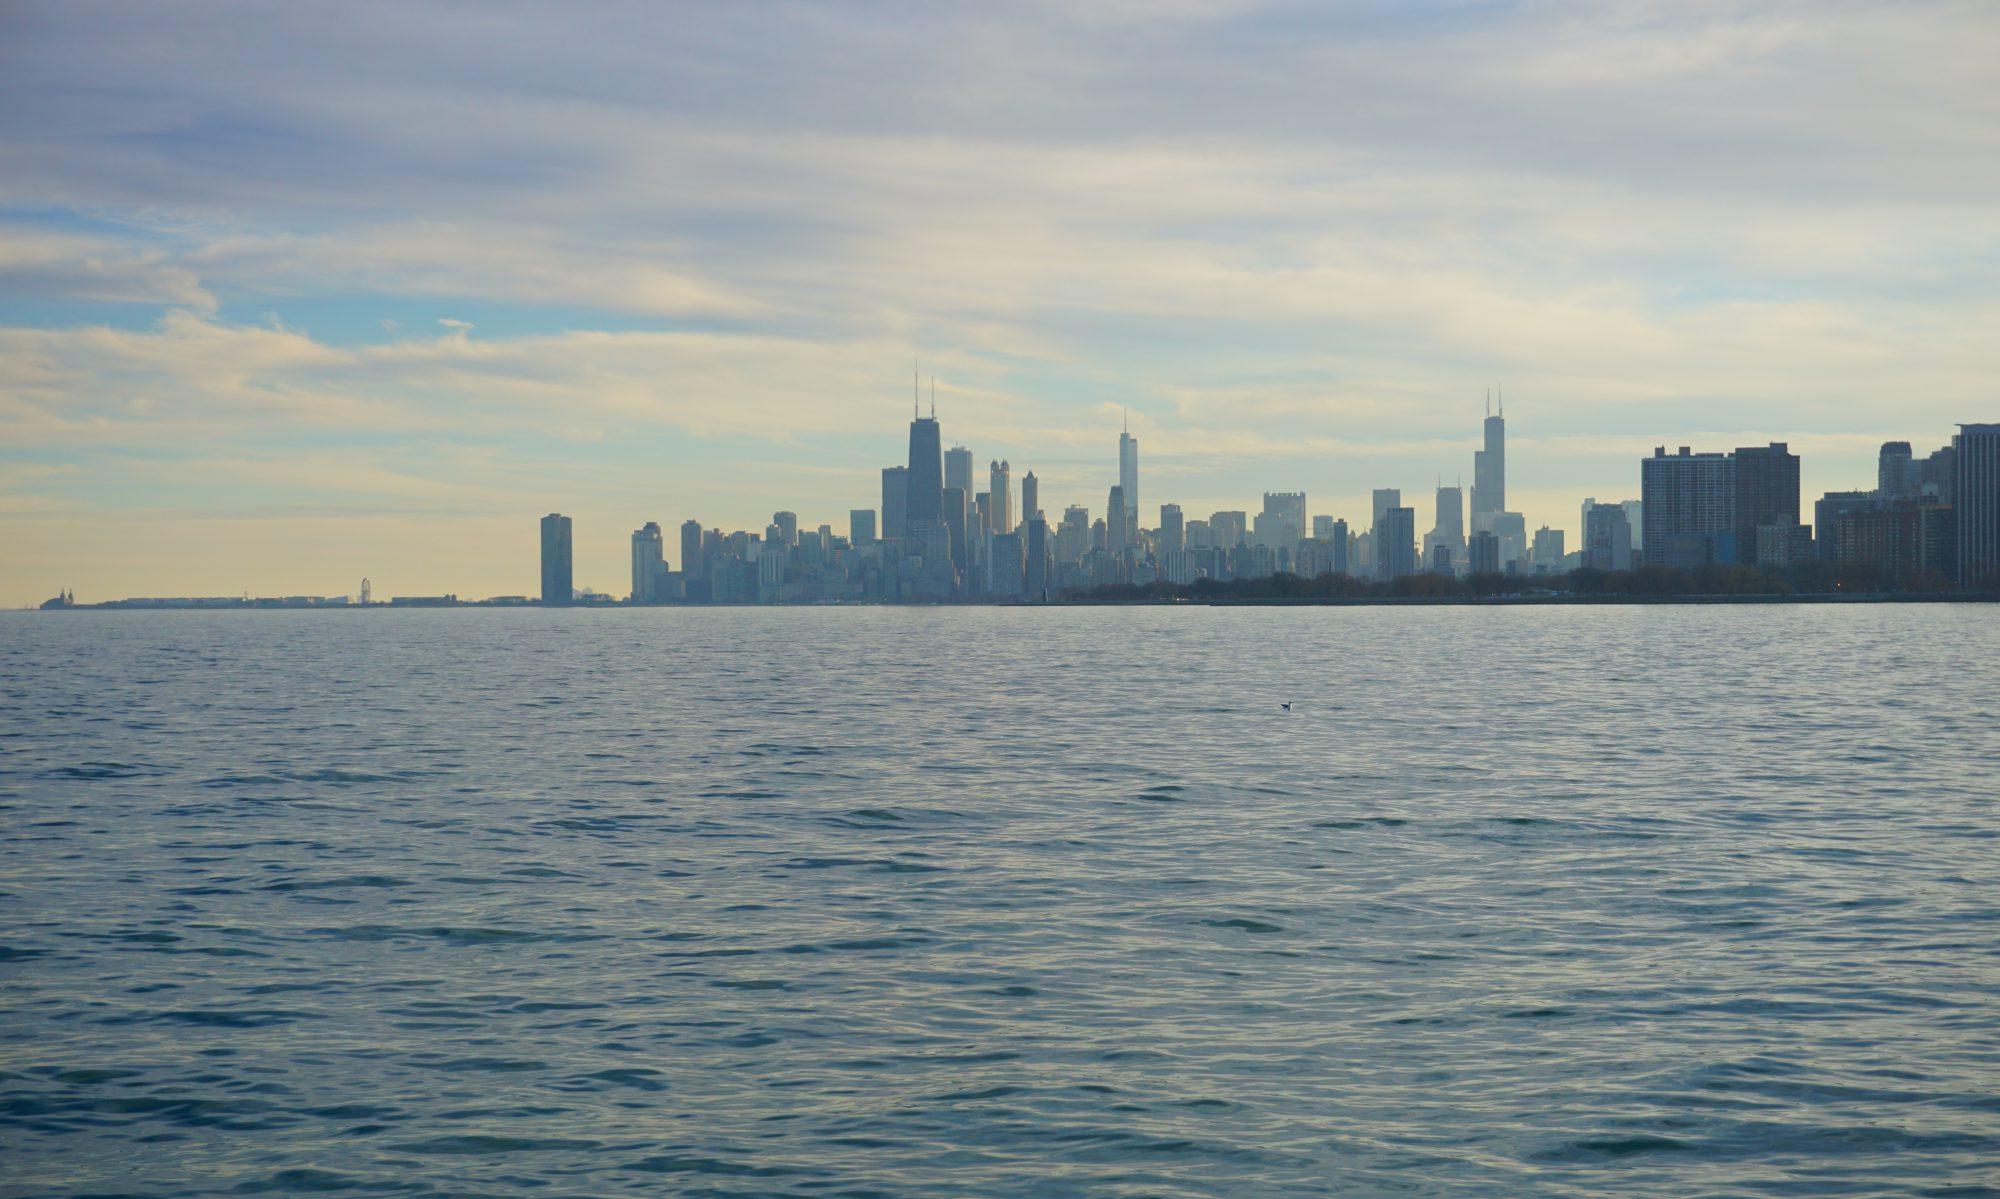 The Chicago Flâneur